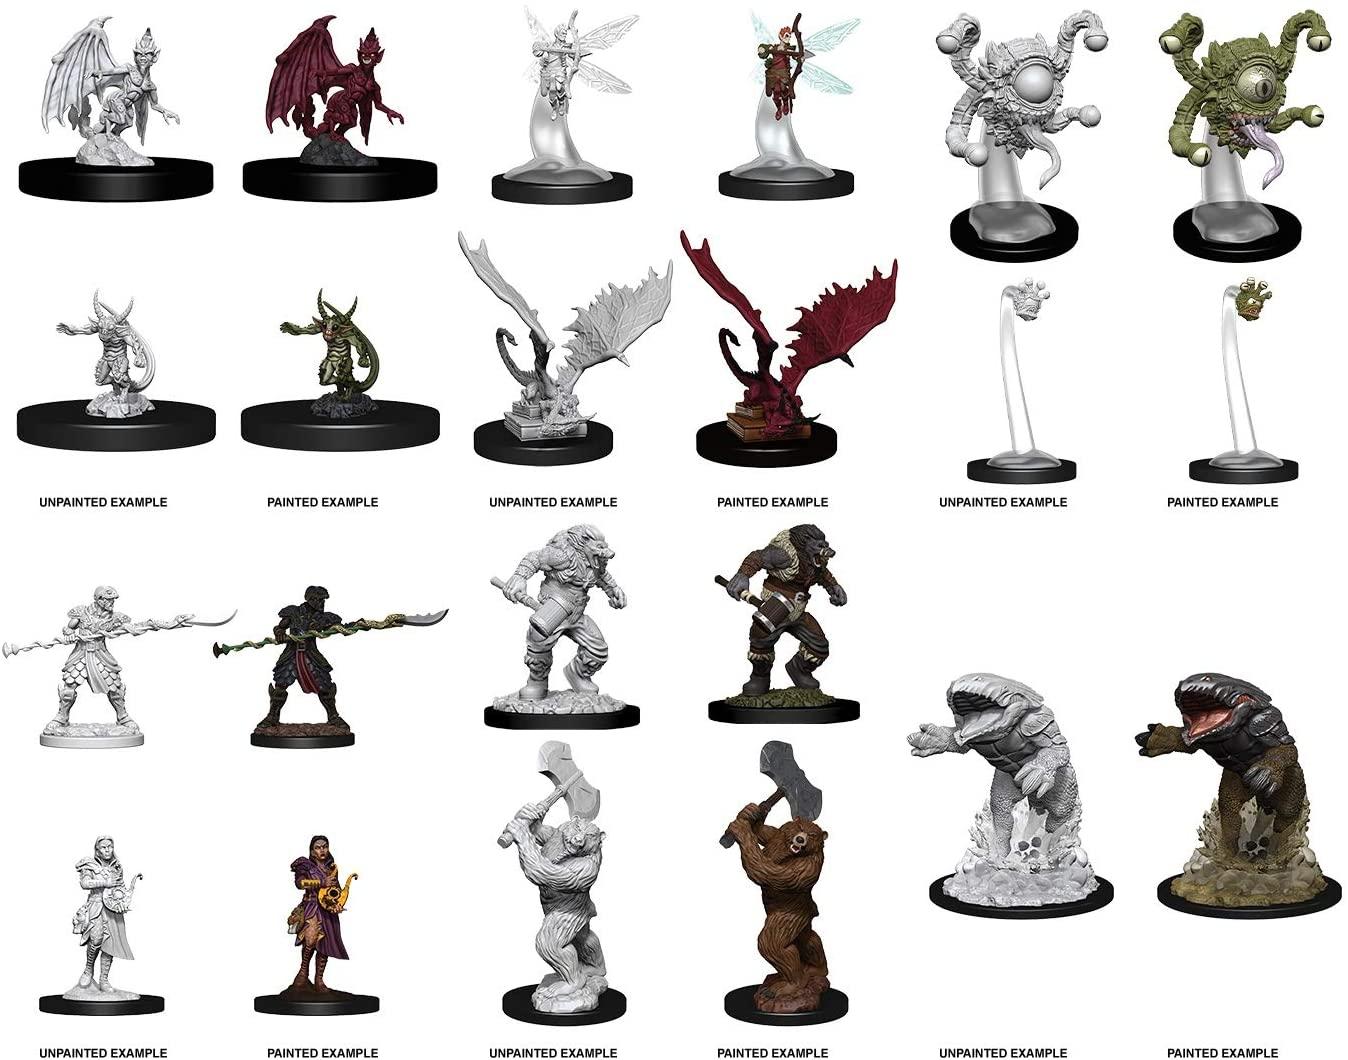 D&D Nolzur`s Miniatures W9: Bulette, Wereboar & Werebear, Yaun-Ti Purebloods, Spectator & Gazers, Sprite & Pseudodragon, Quasit & Imp